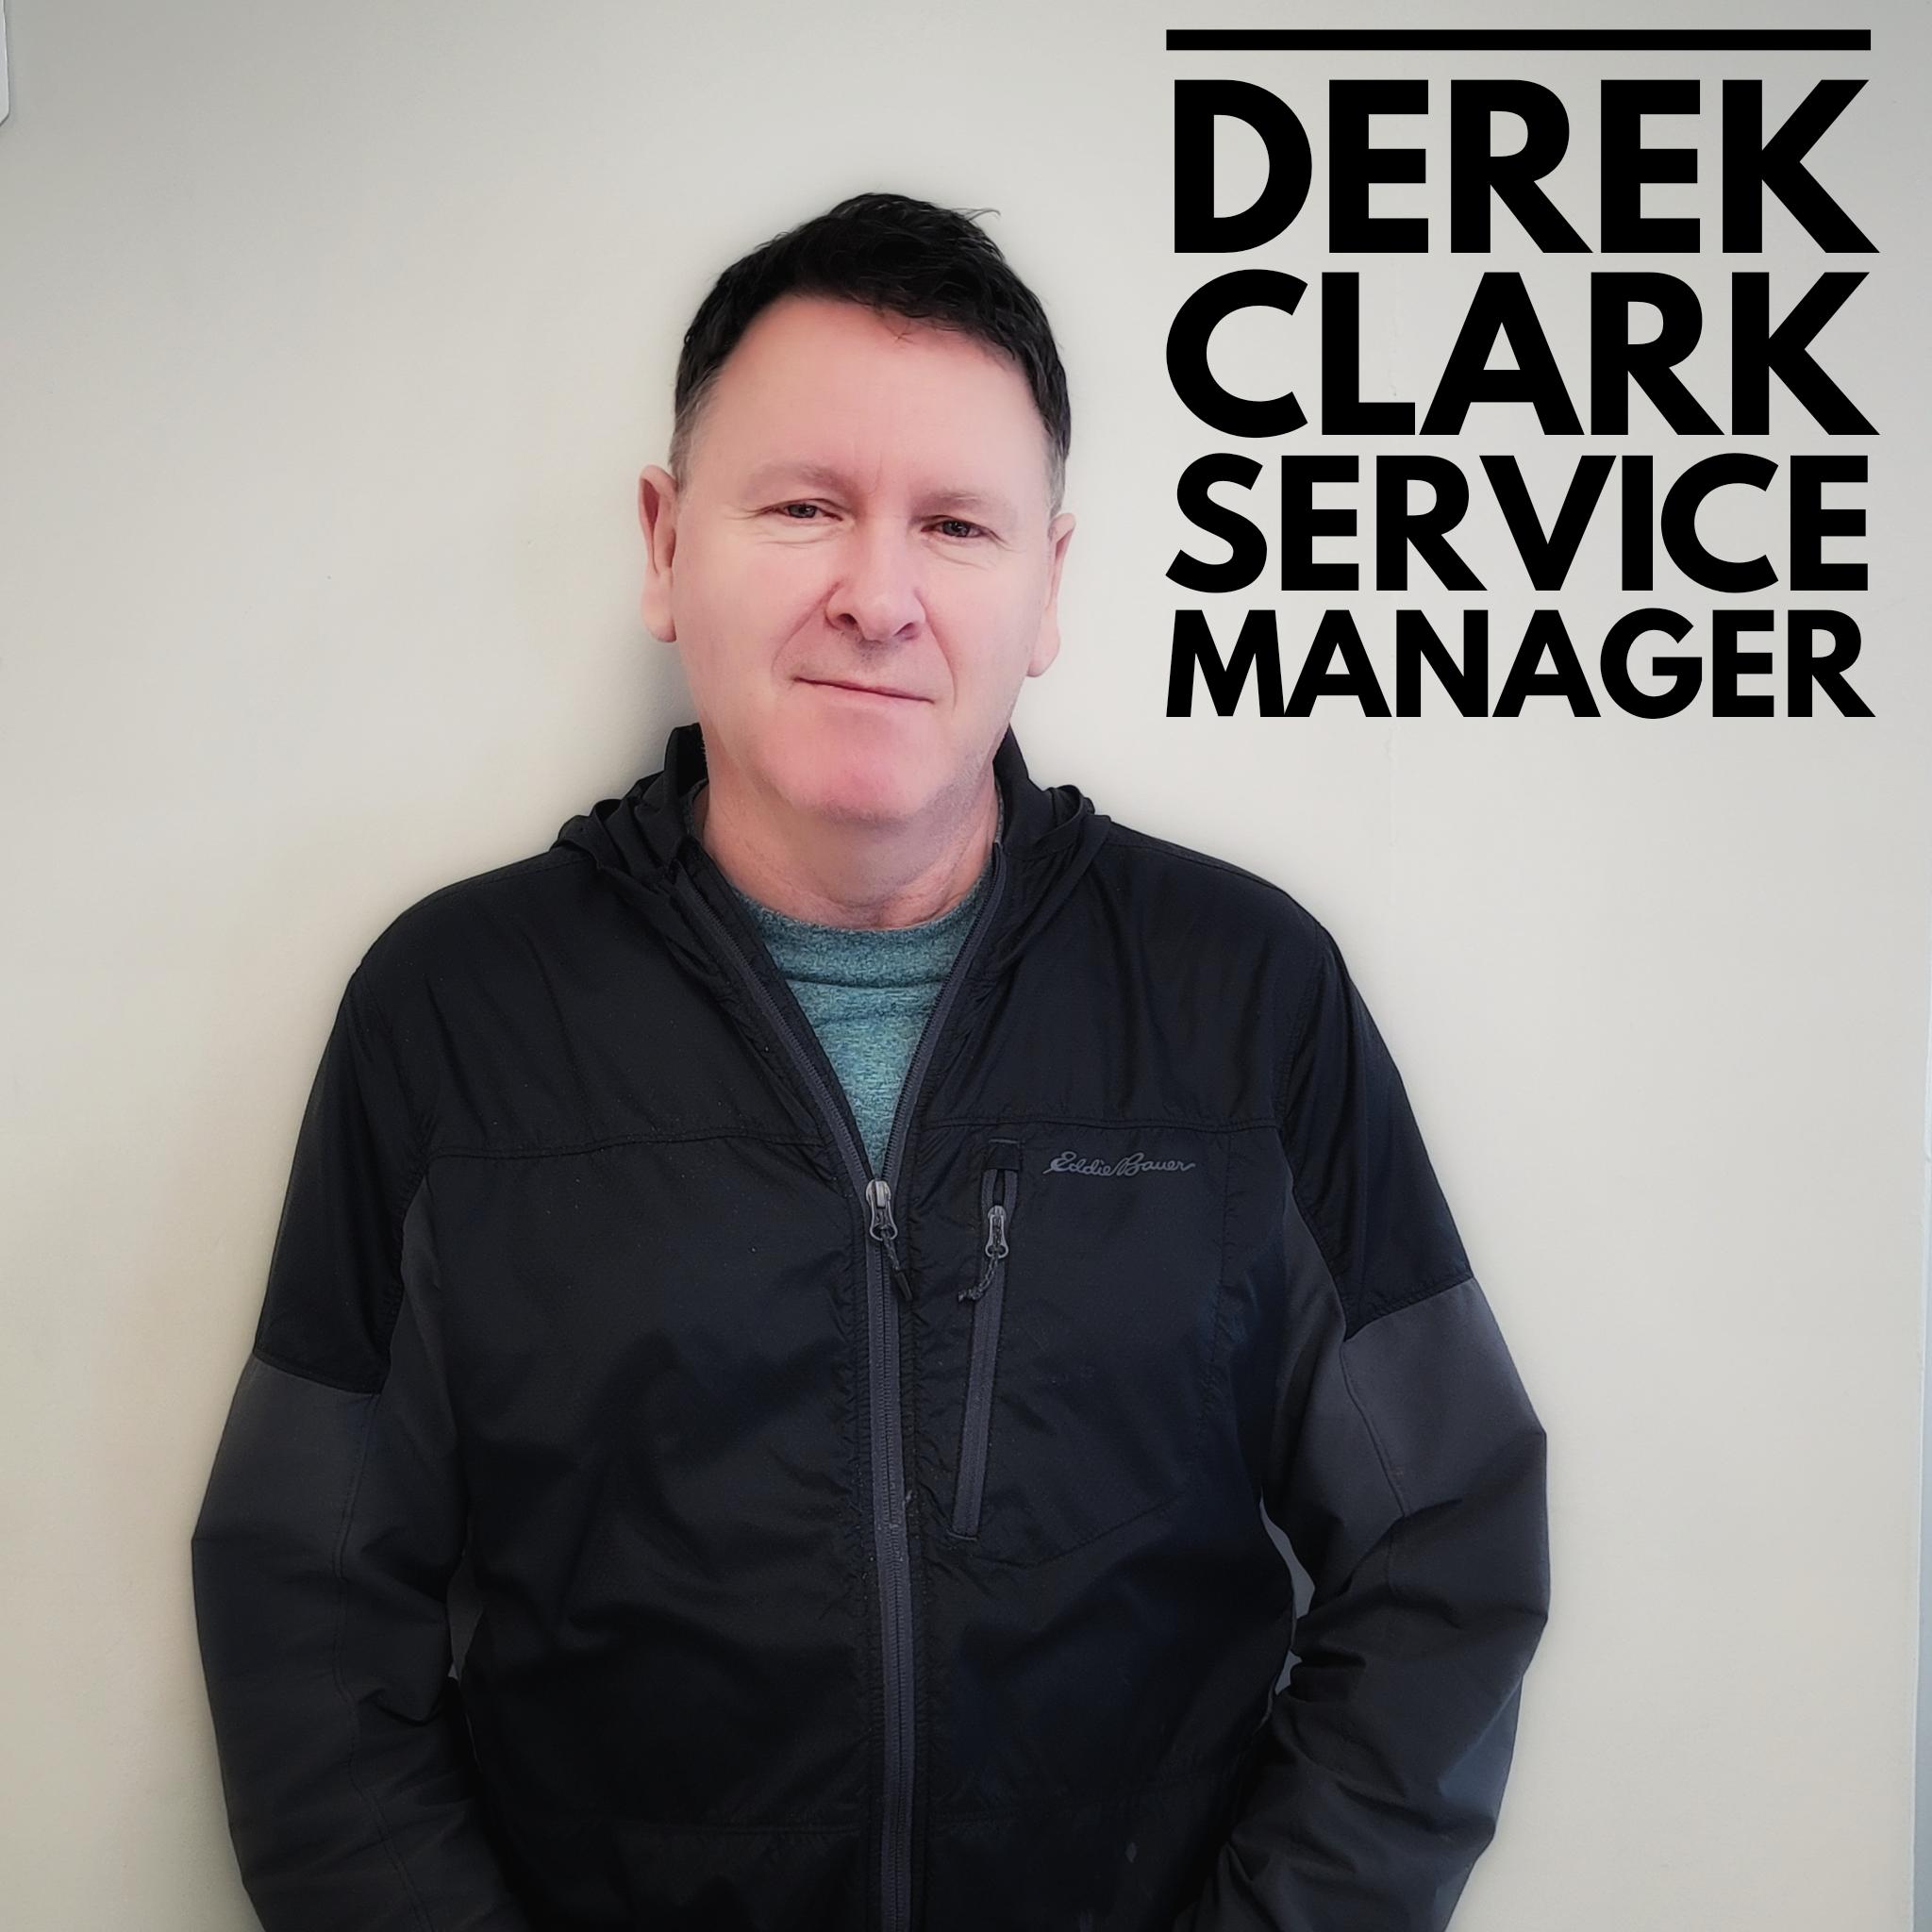 Derek Clark